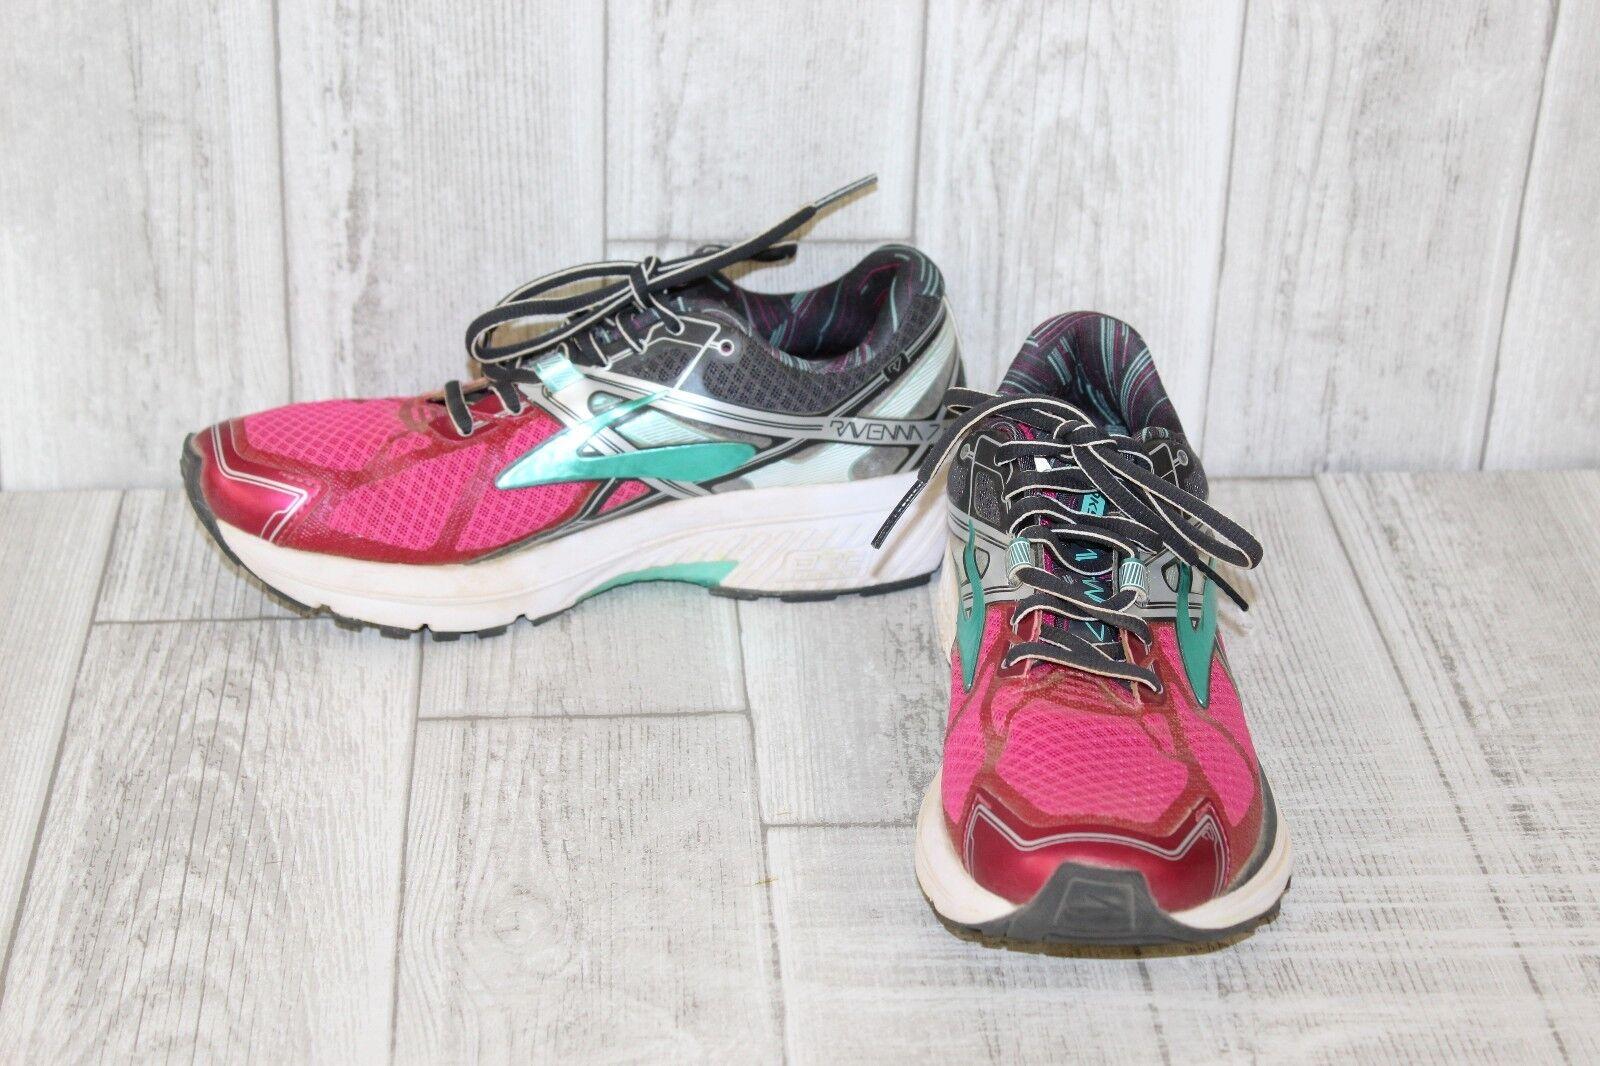 Brooks Ravenna 7 Running Chaussures - Femme 7B, Fuchsia  Violet /Anthracite/Cockatoo